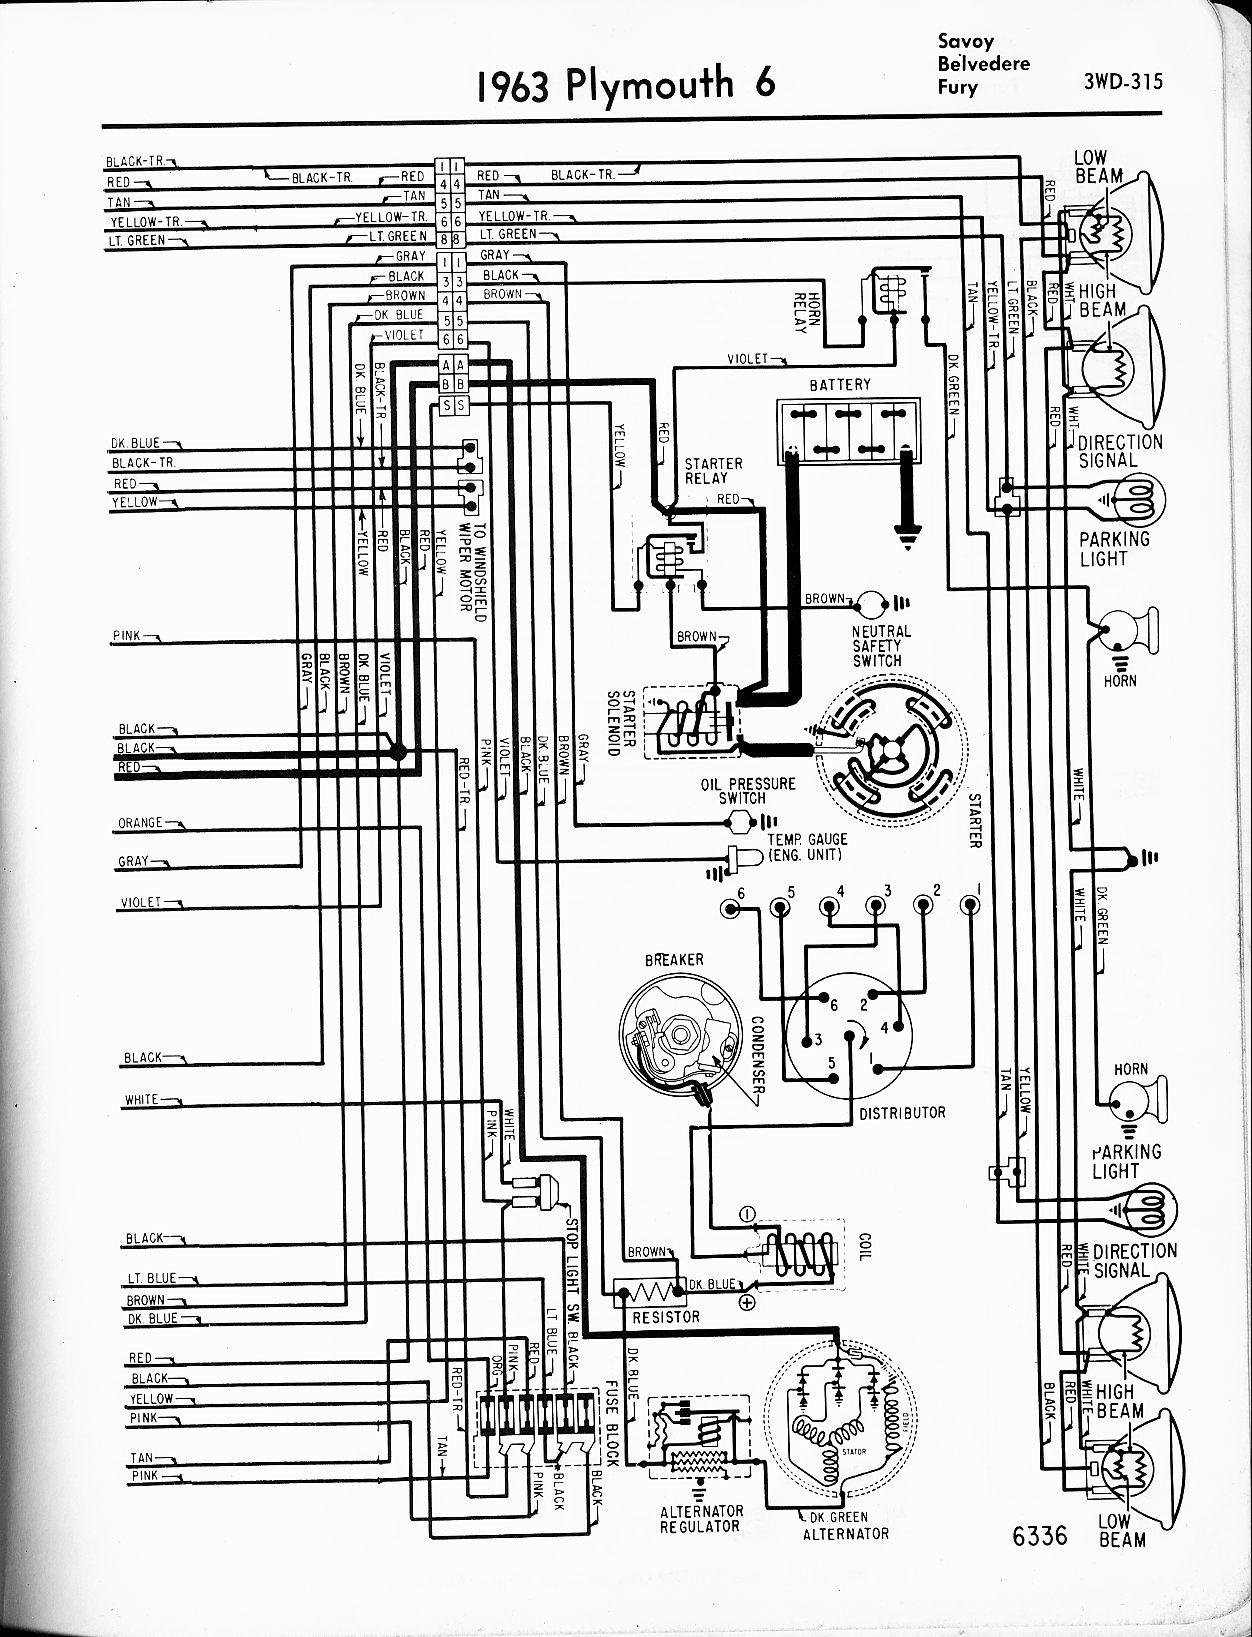 1969 Plymouth Fury Convertible Wiring Diagram - Jenn Air Stove Top Wiring  Diagram for Wiring Diagram SchematicsWiring Diagram Schematics